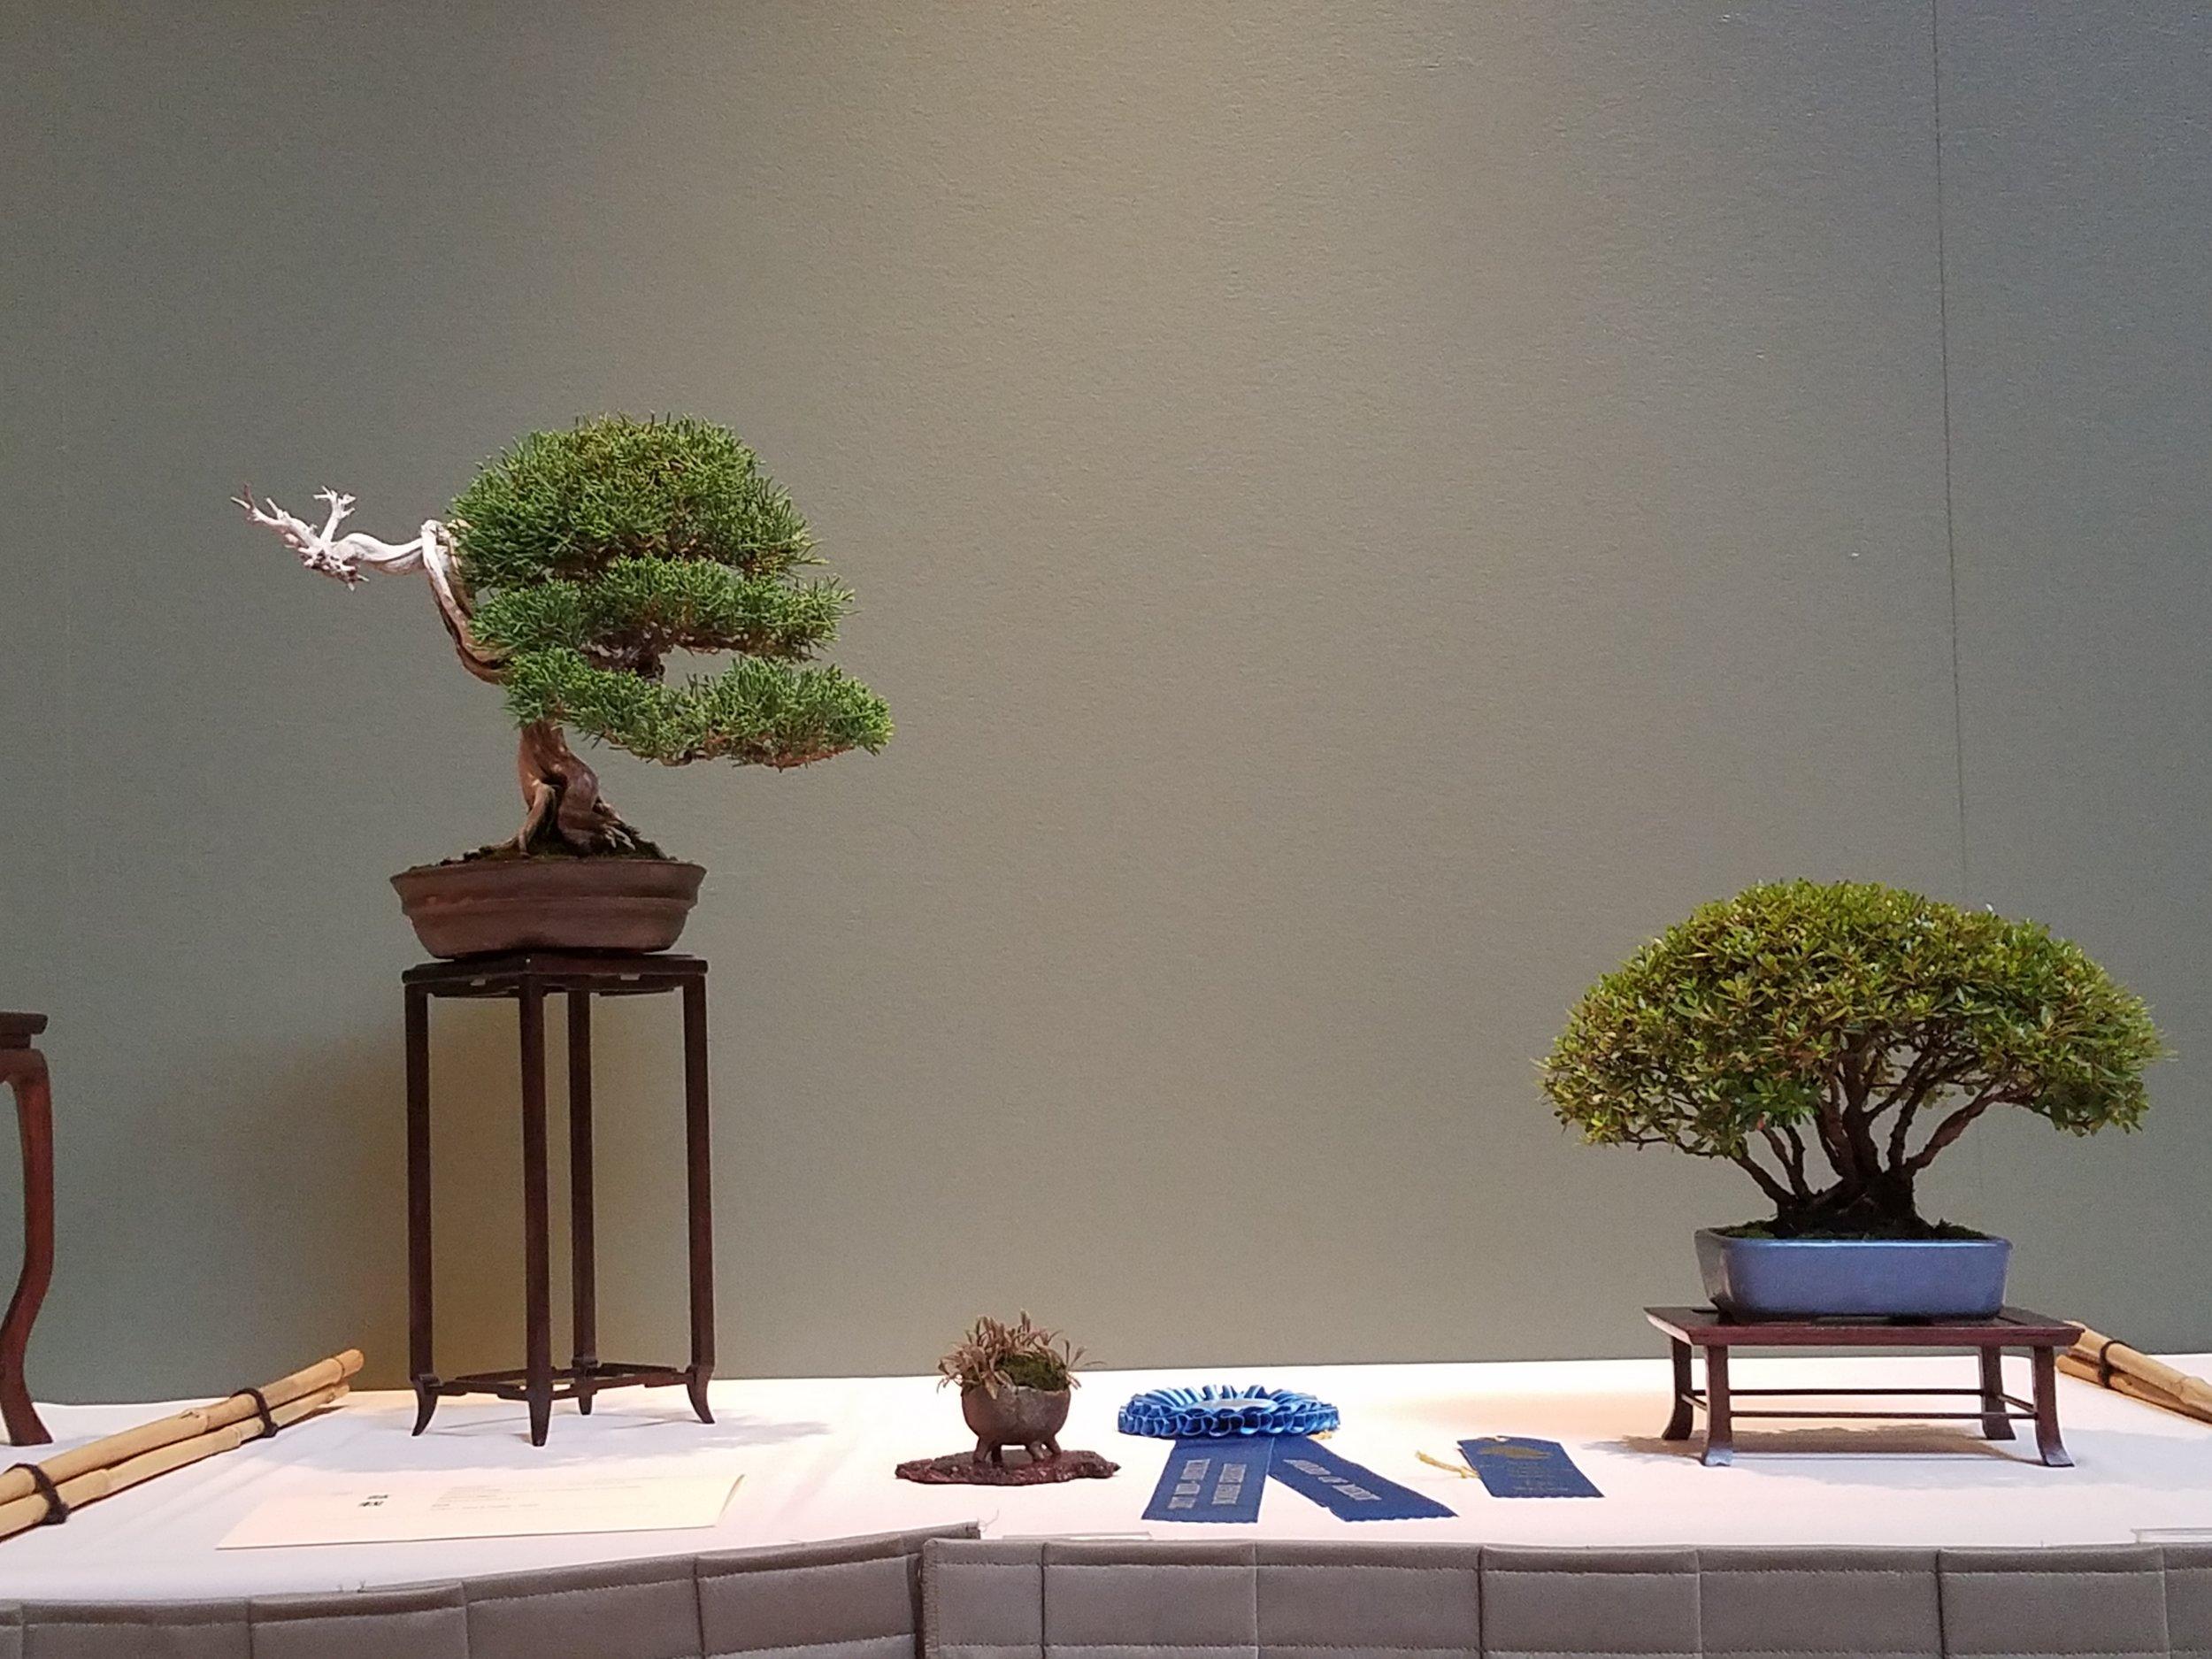 2017 Mid-America Bonsai Exhibition - Itoigawa Shimpaku Juniper & Dwarf Azalea - Slant & Clump